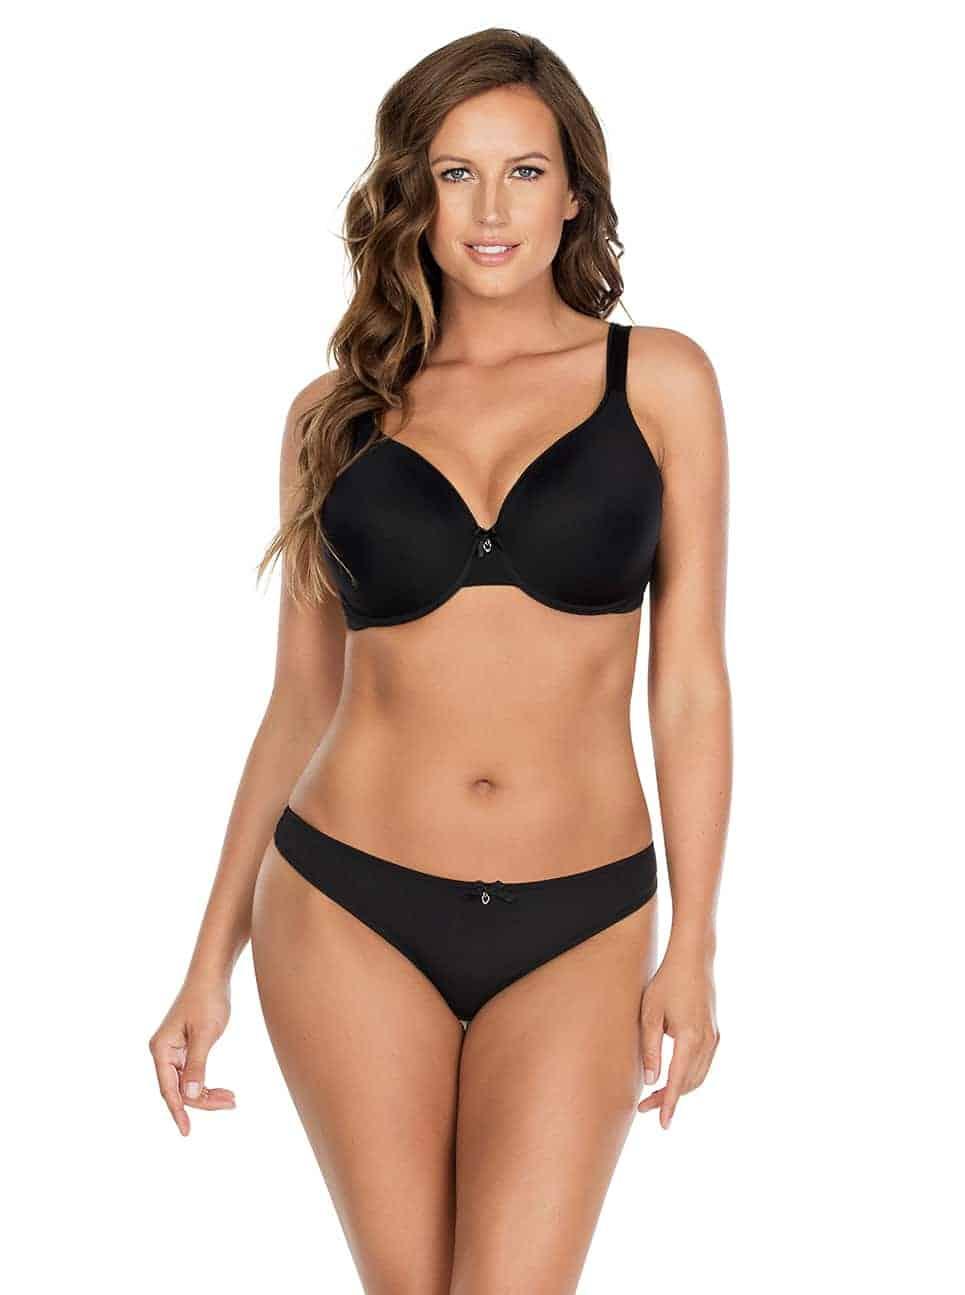 Jeanie TShirtBra4812 Thong4804 Black Front - Jeanie T-Shirt Bra - Black - 4812